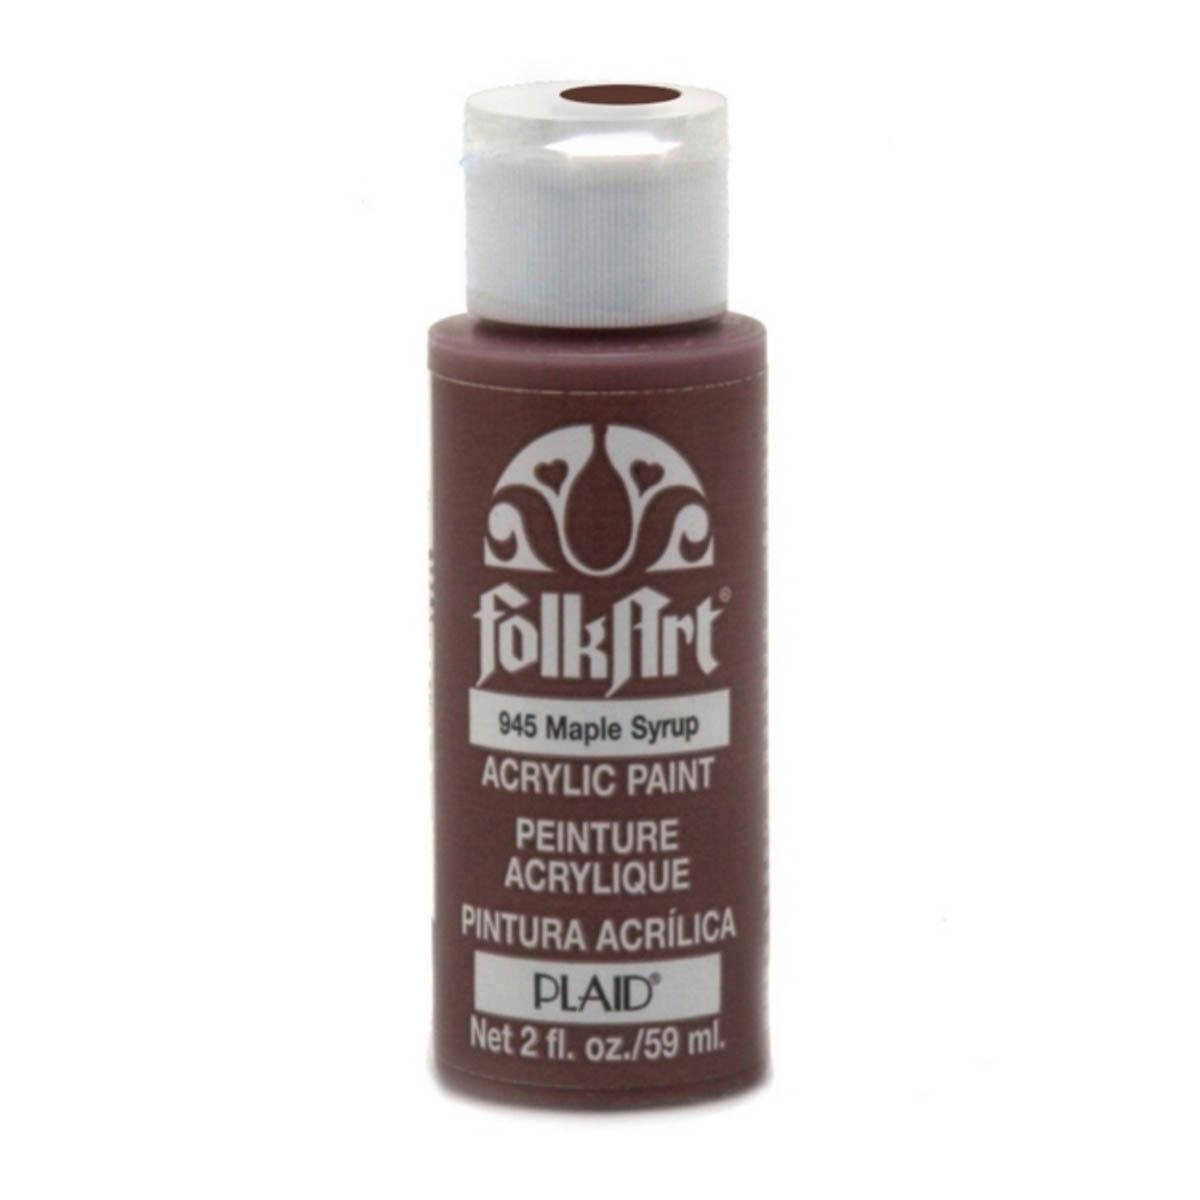 FolkArt ® Acrylic Colors - Maple Syrup, 2 oz.